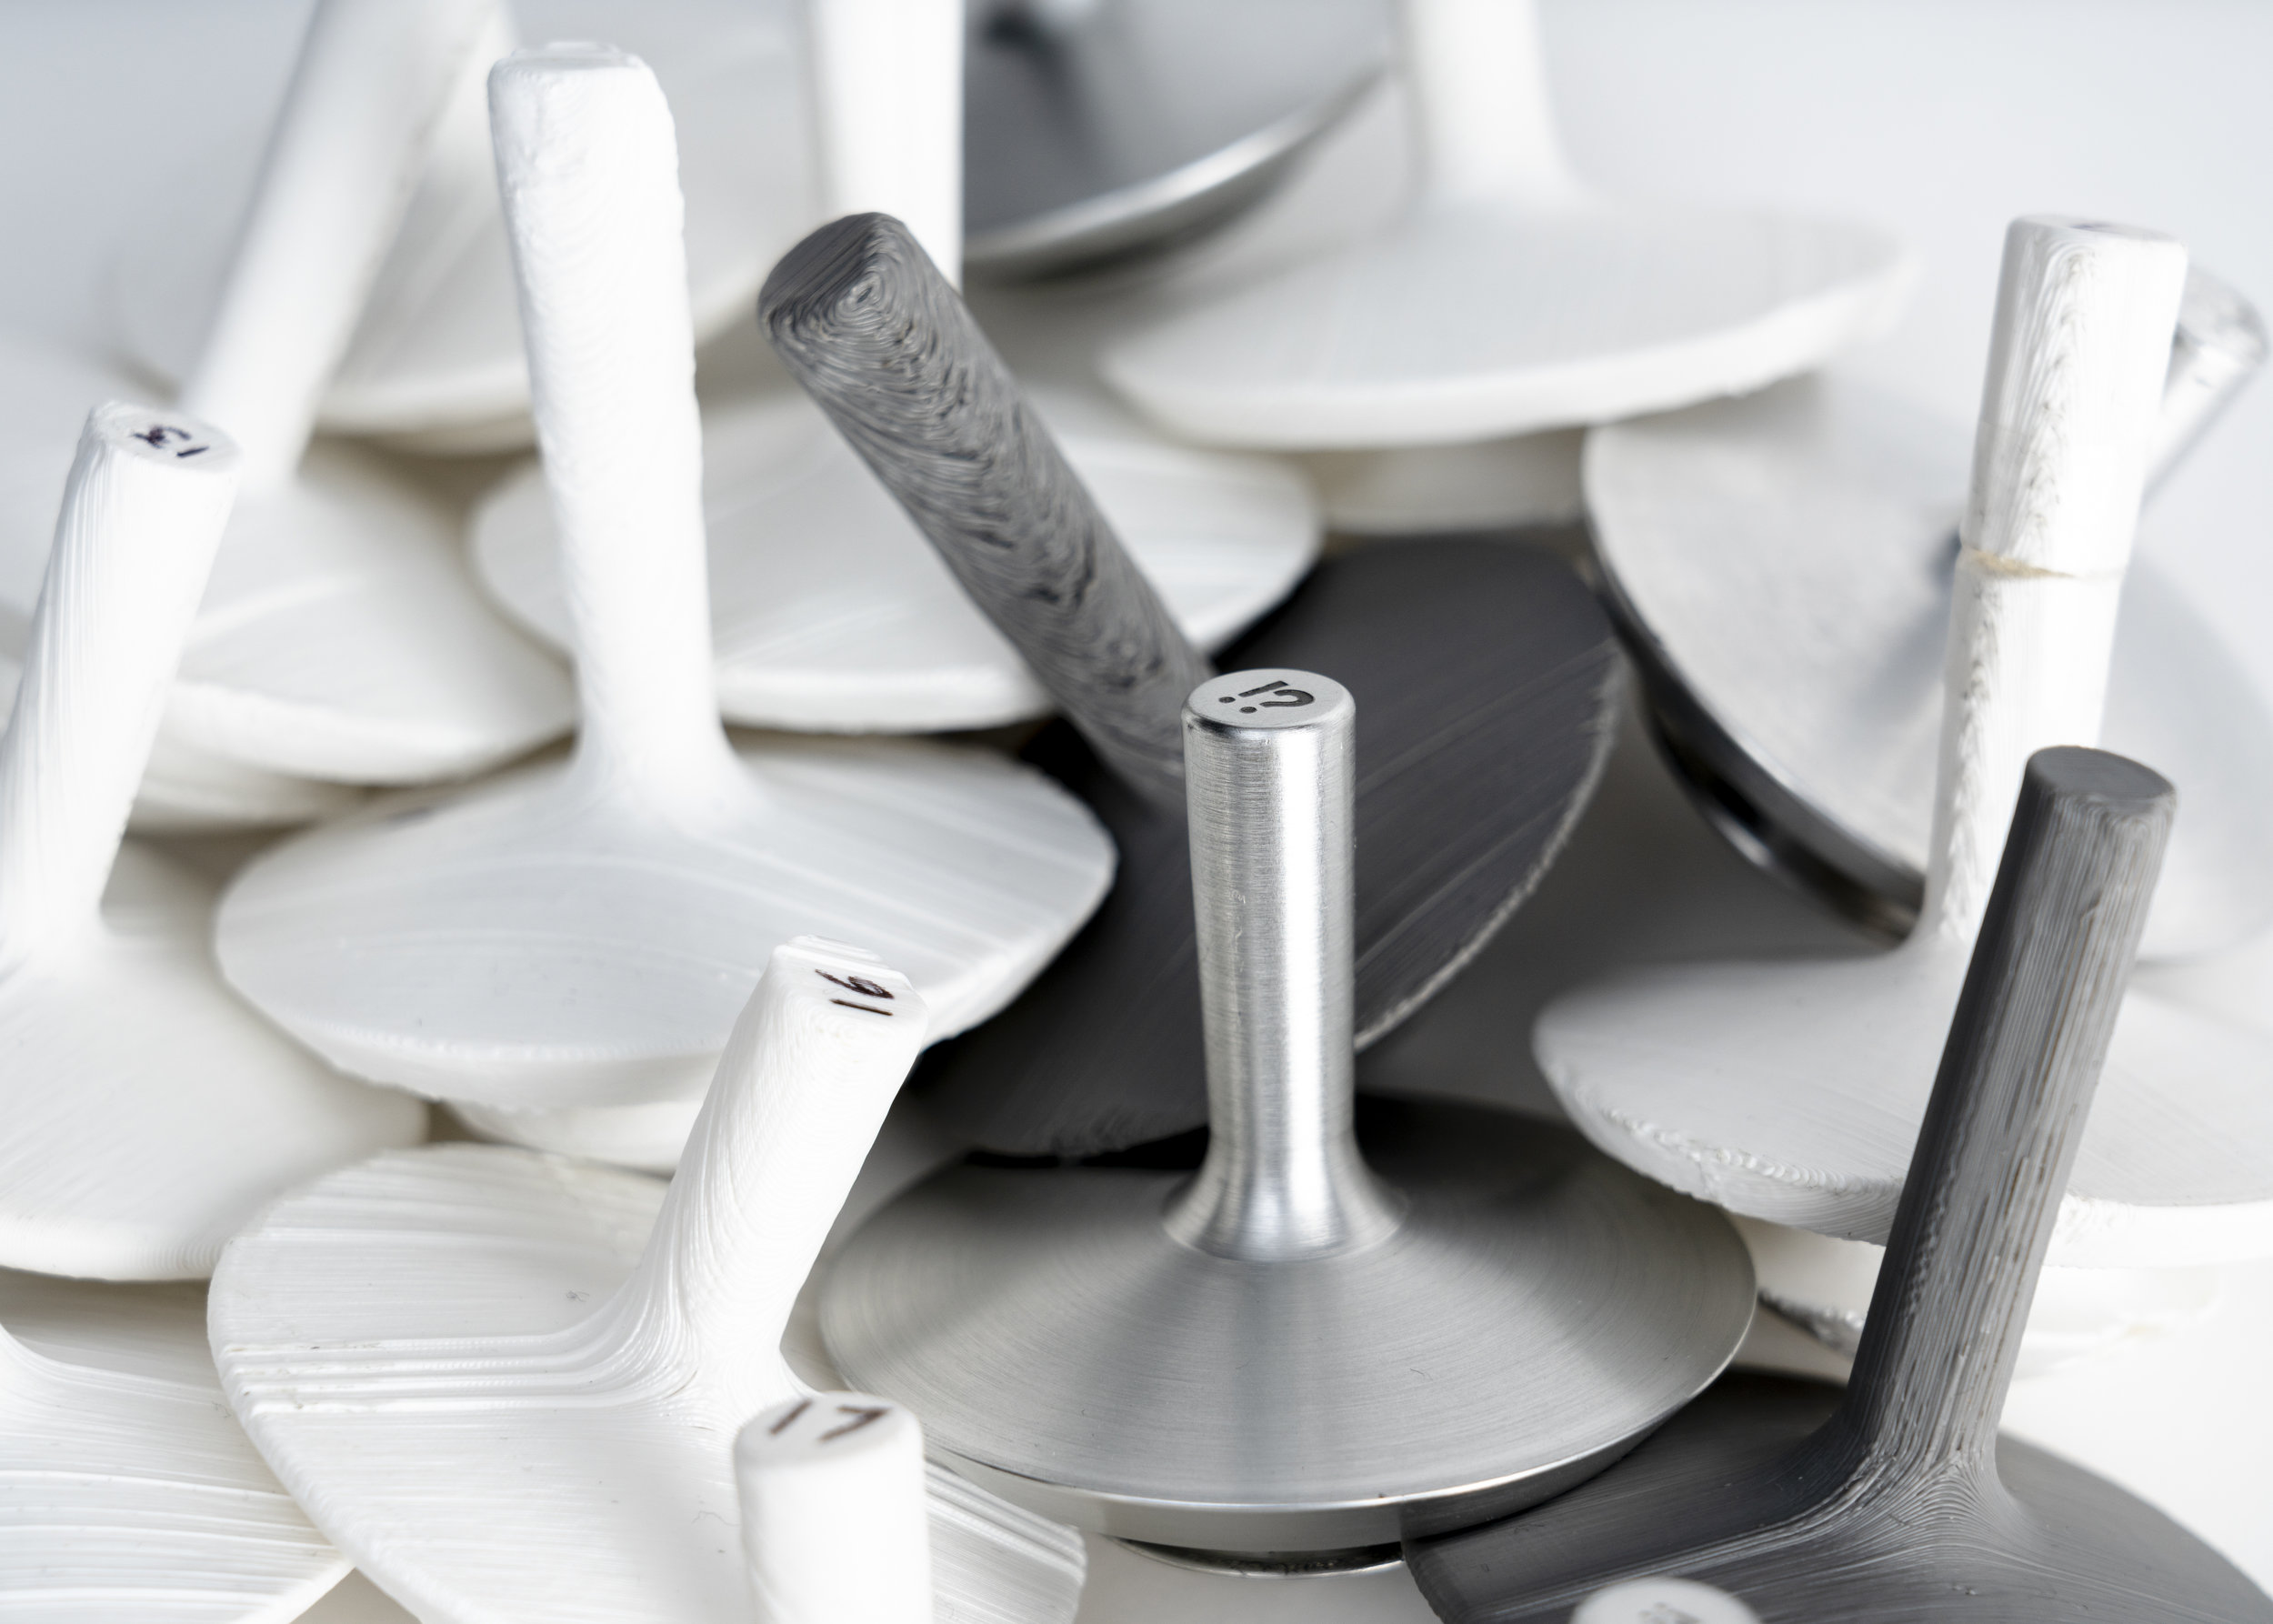 spin-bottle-opener-prototypes-nicholas-baker